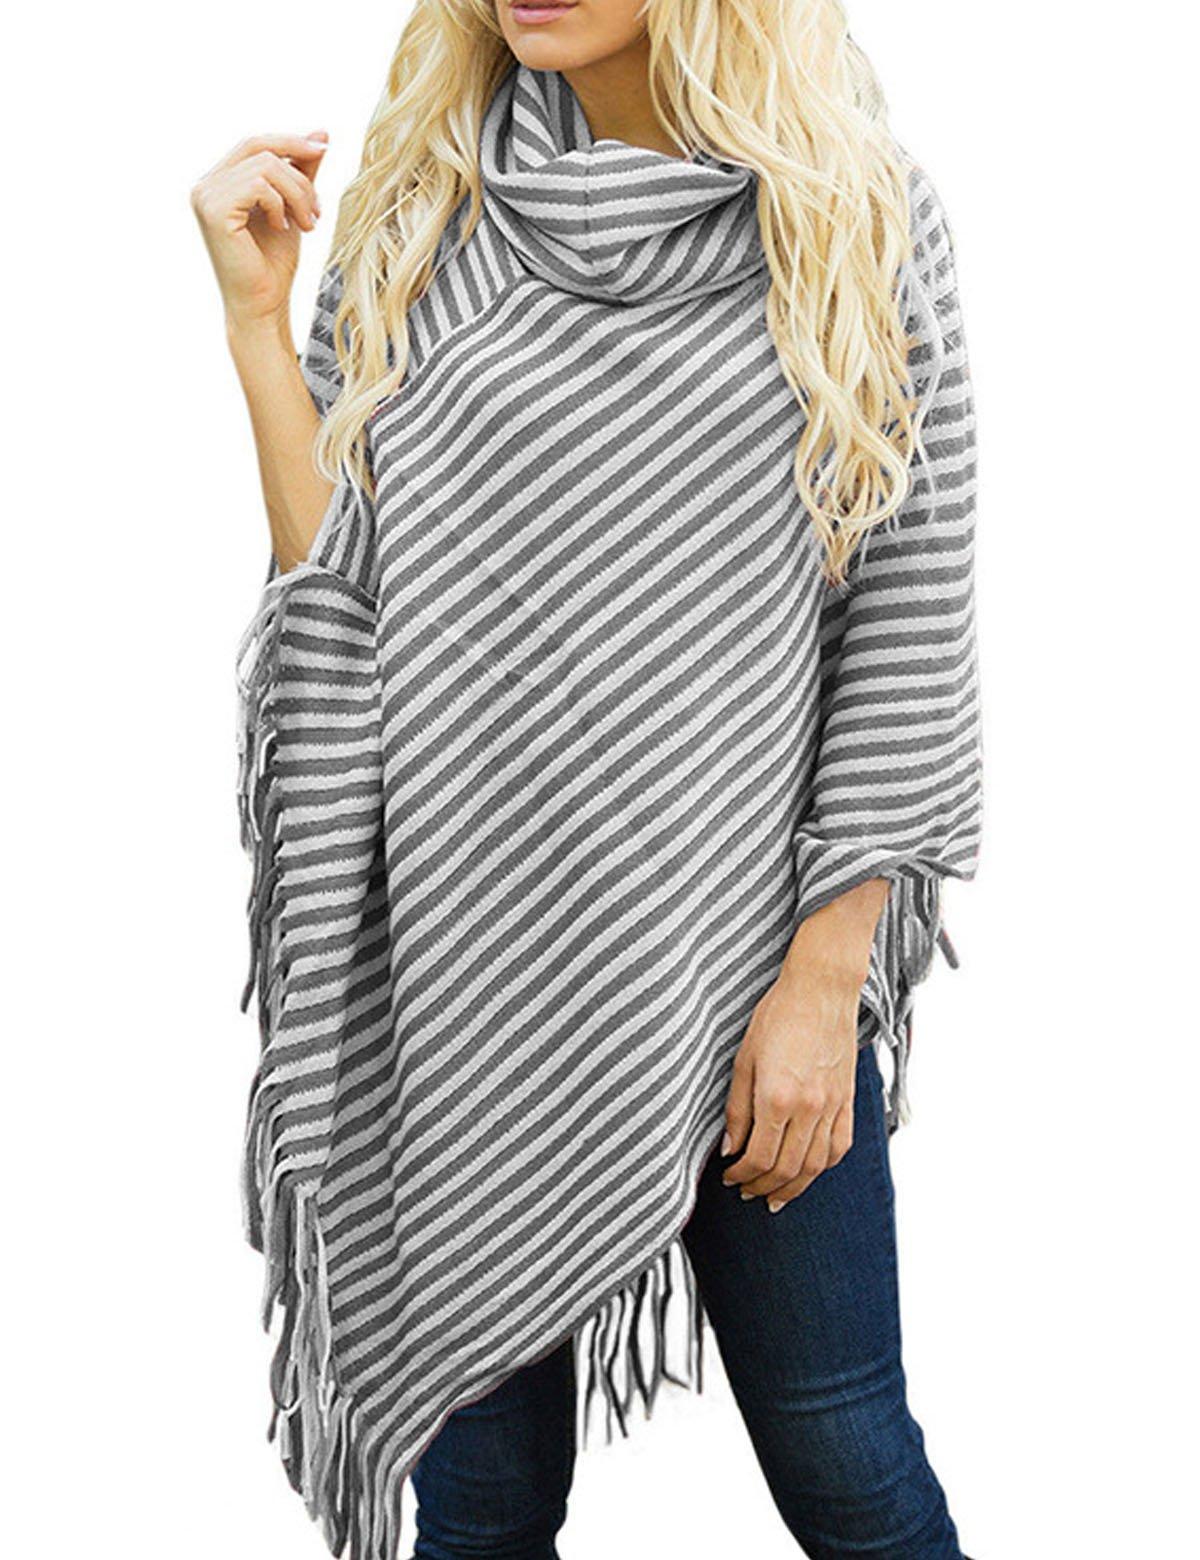 JYAOVO Womens Fashion Cape Poncho Turtleneck Knit Striped Tassel Cloak Coat Outwear One Size Grey